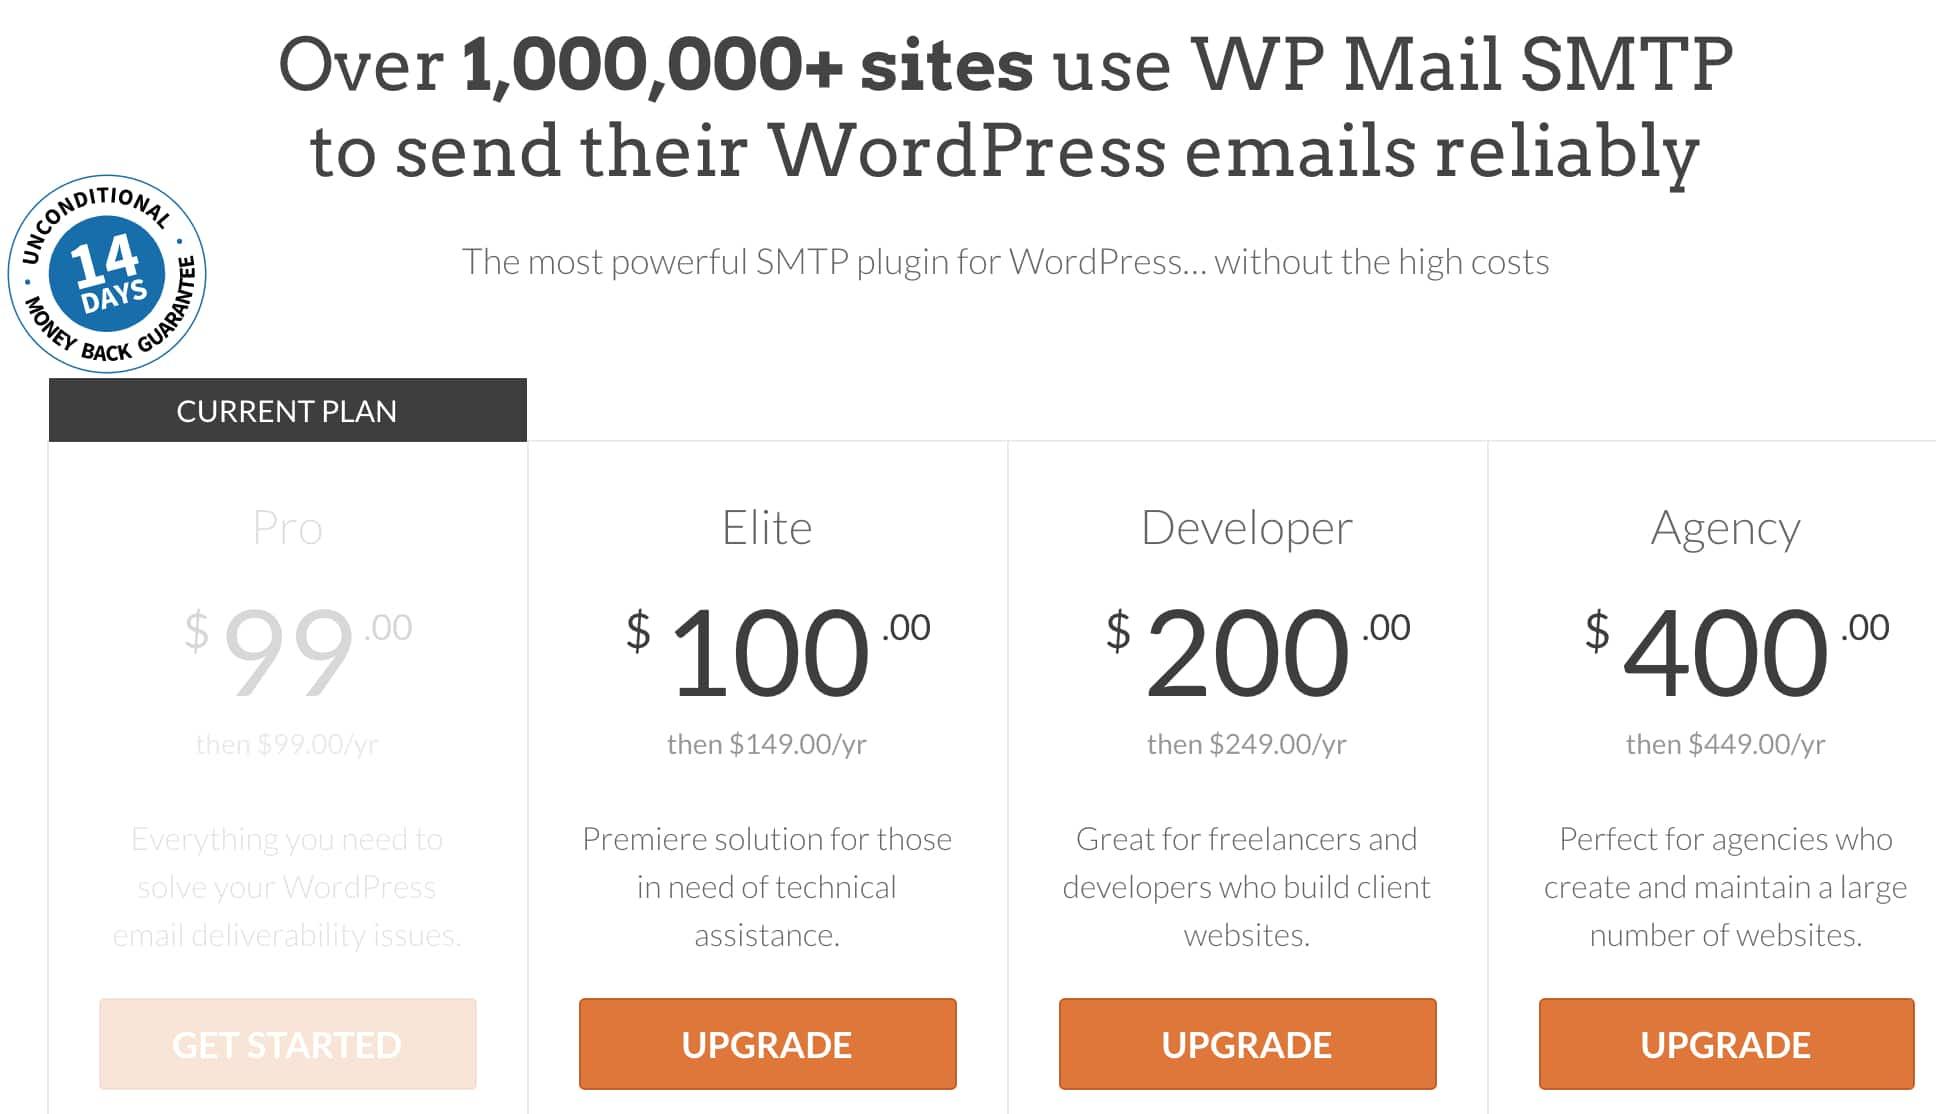 Upgrade WP Mail SMTP license